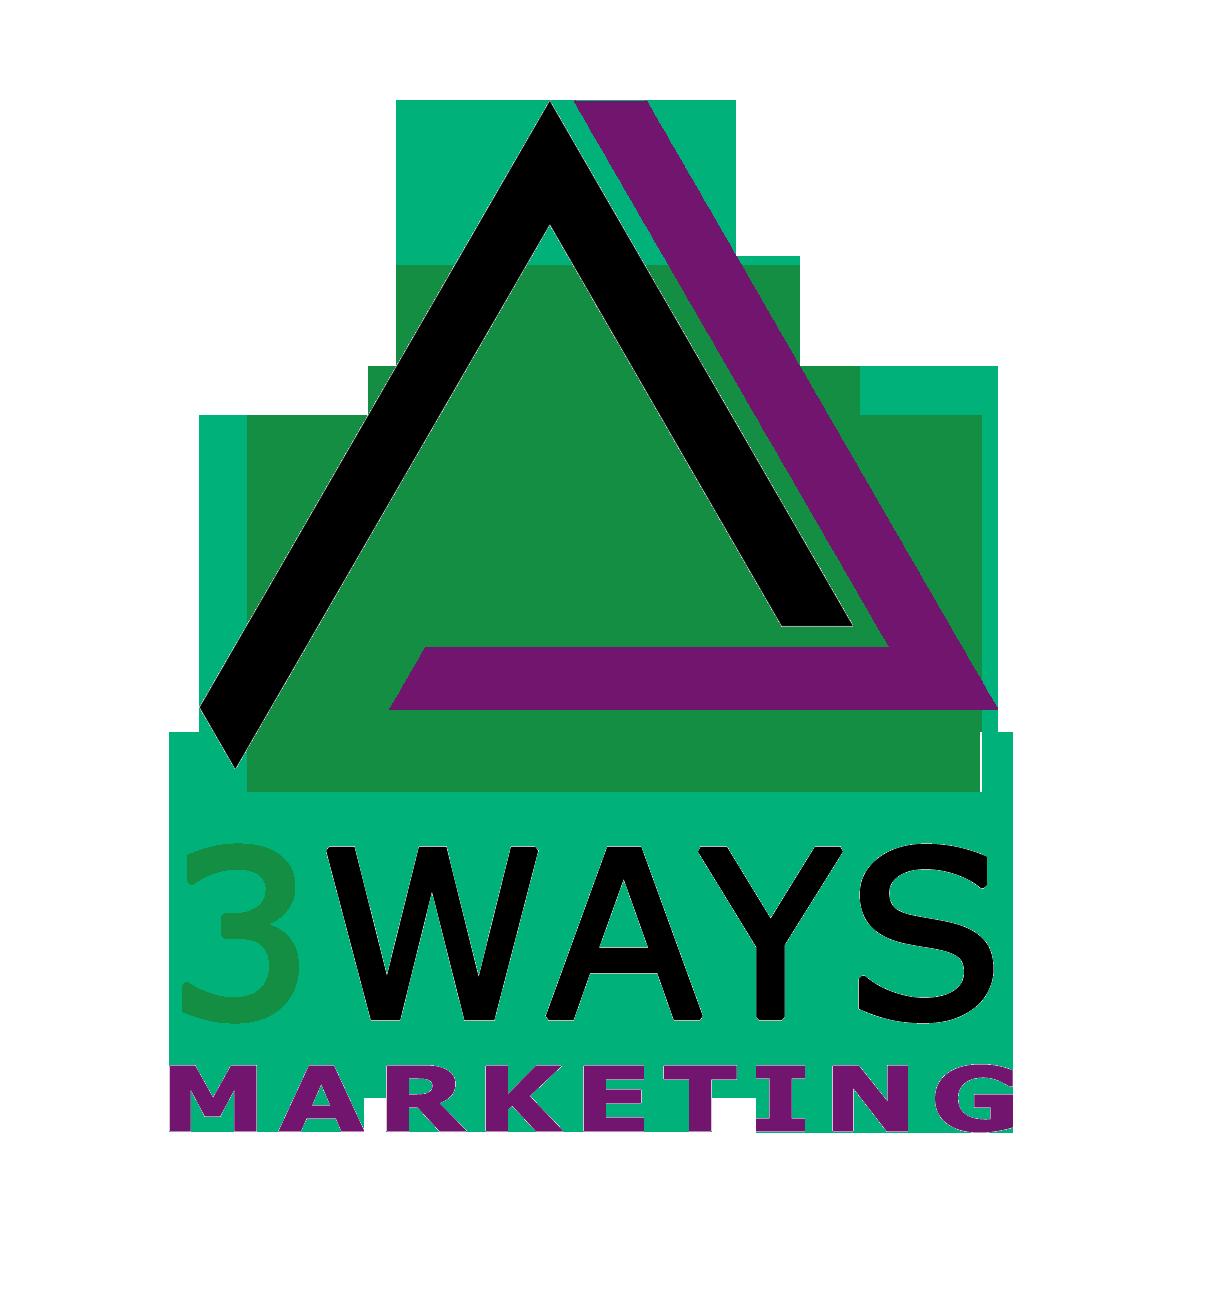 3 Ways Marketing